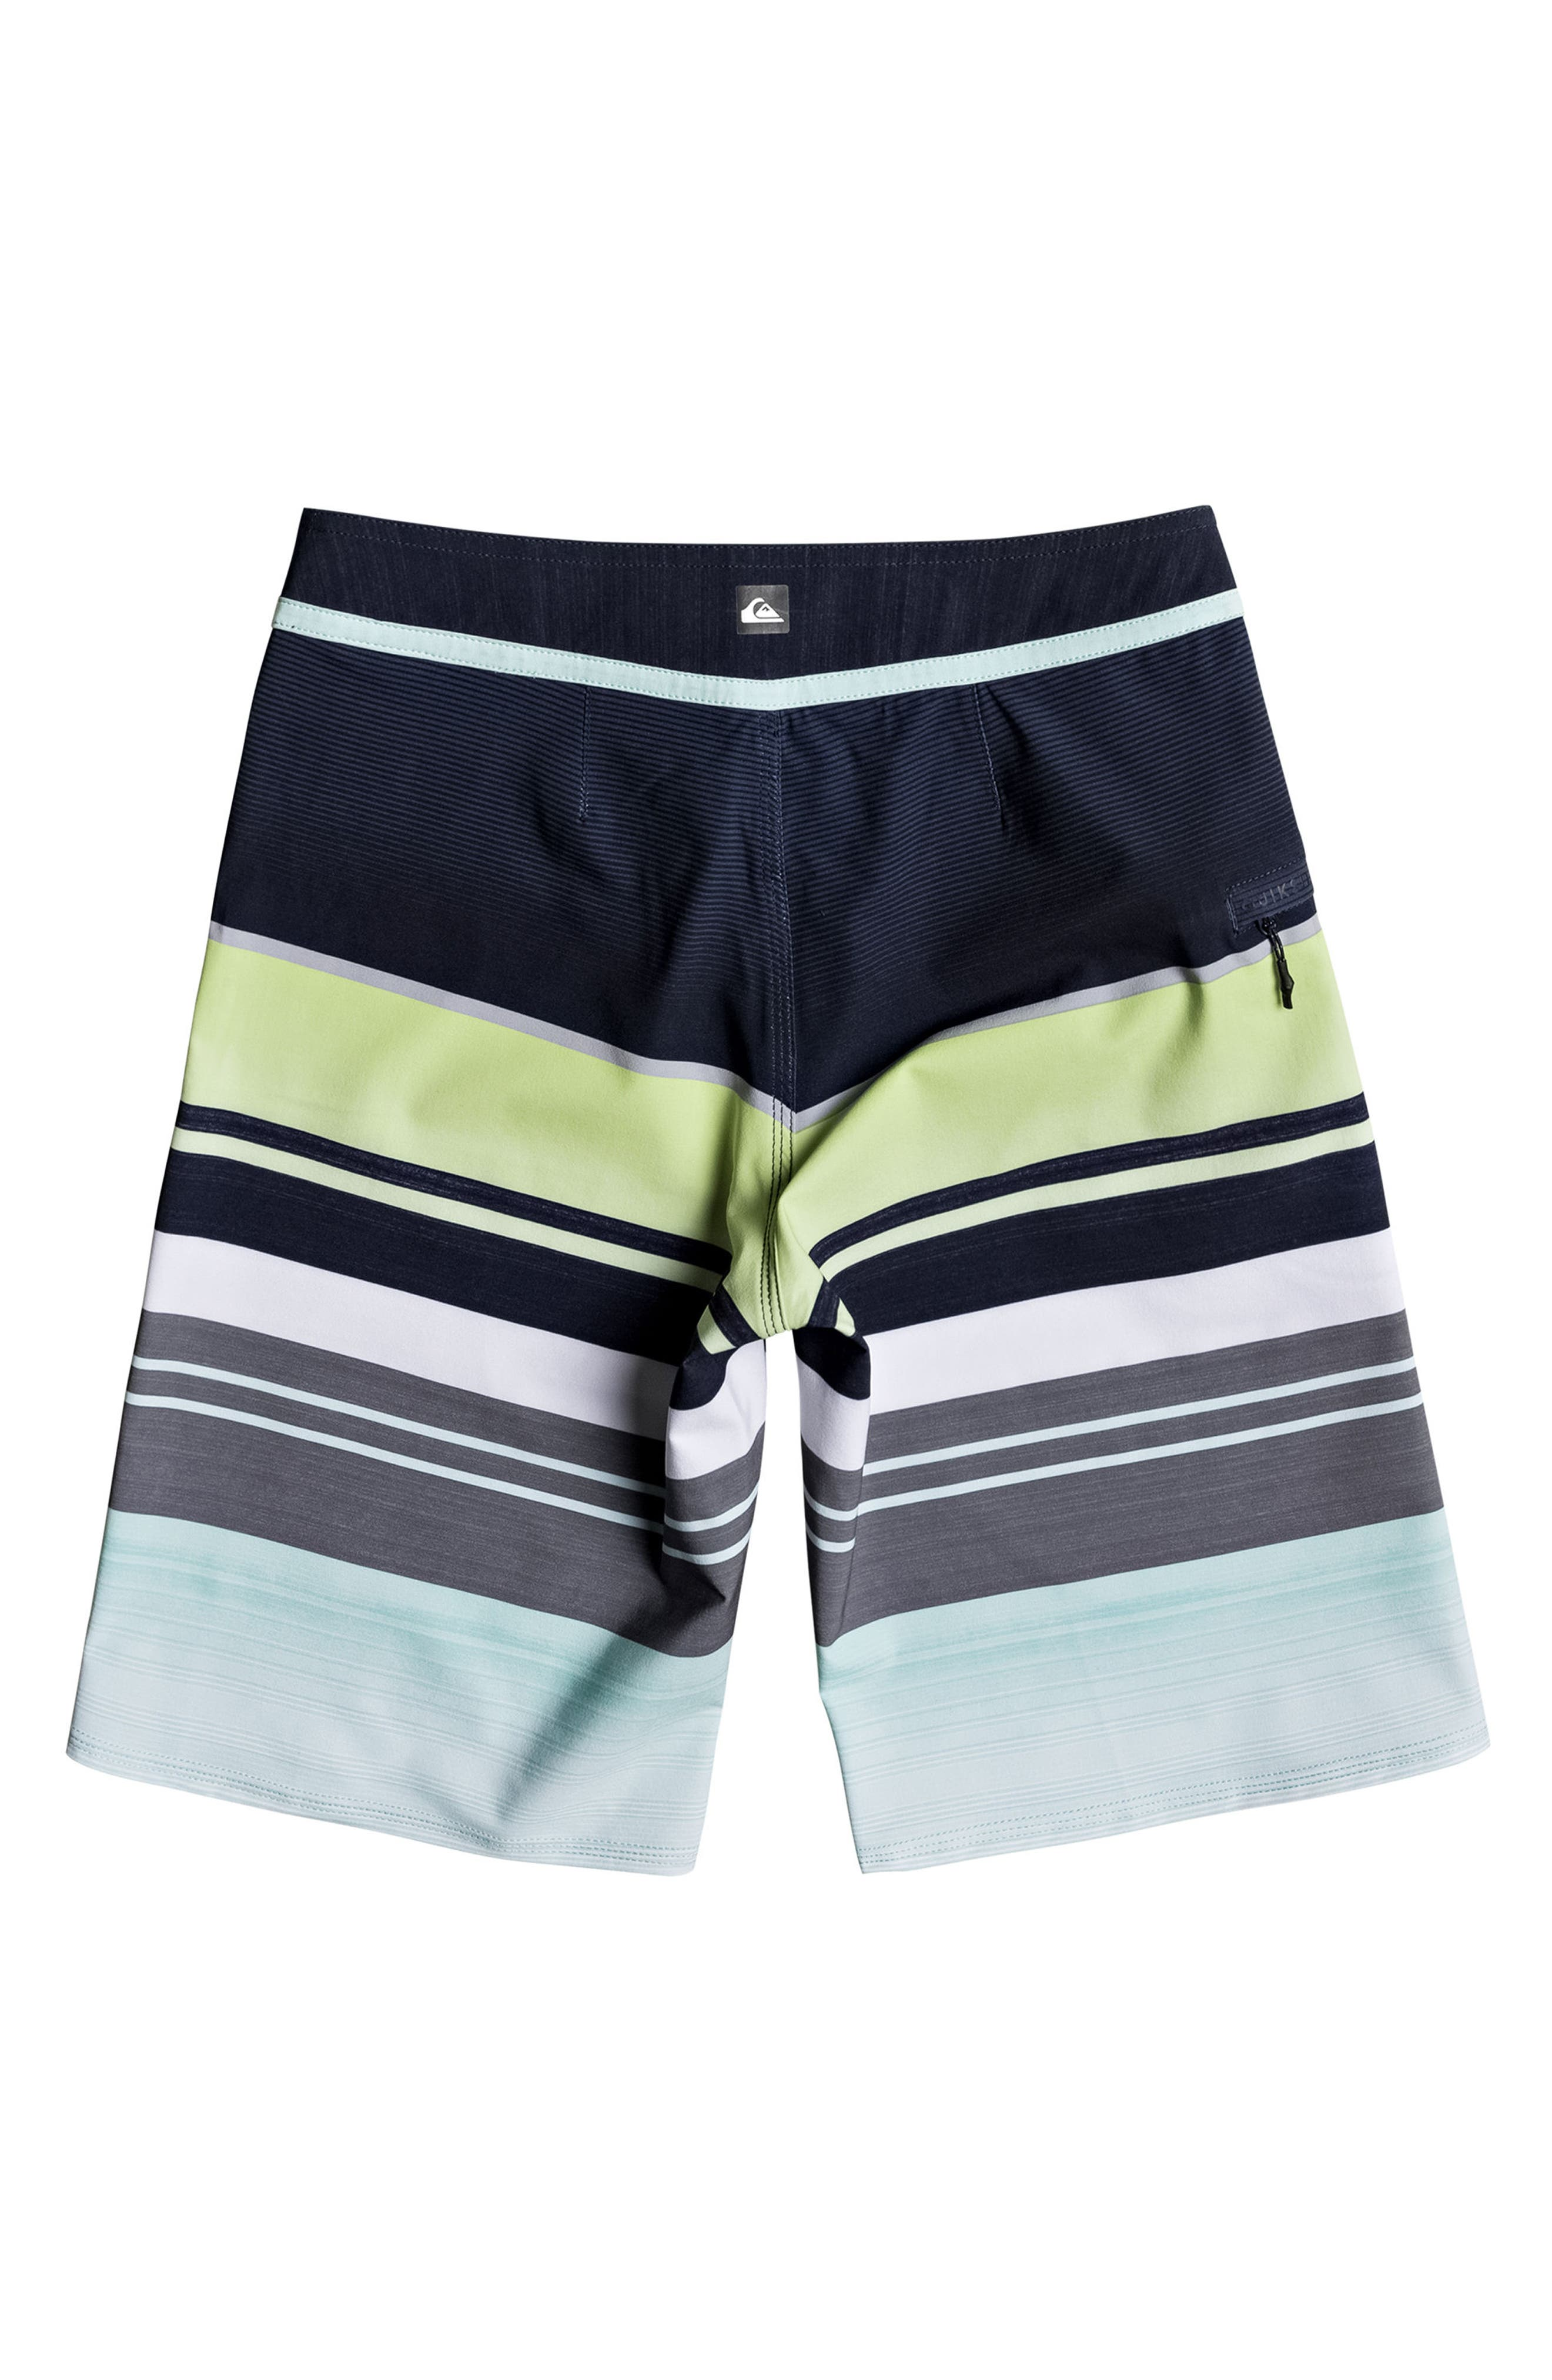 Everyday Stripe Vee Board Shorts,                             Alternate thumbnail 10, color,